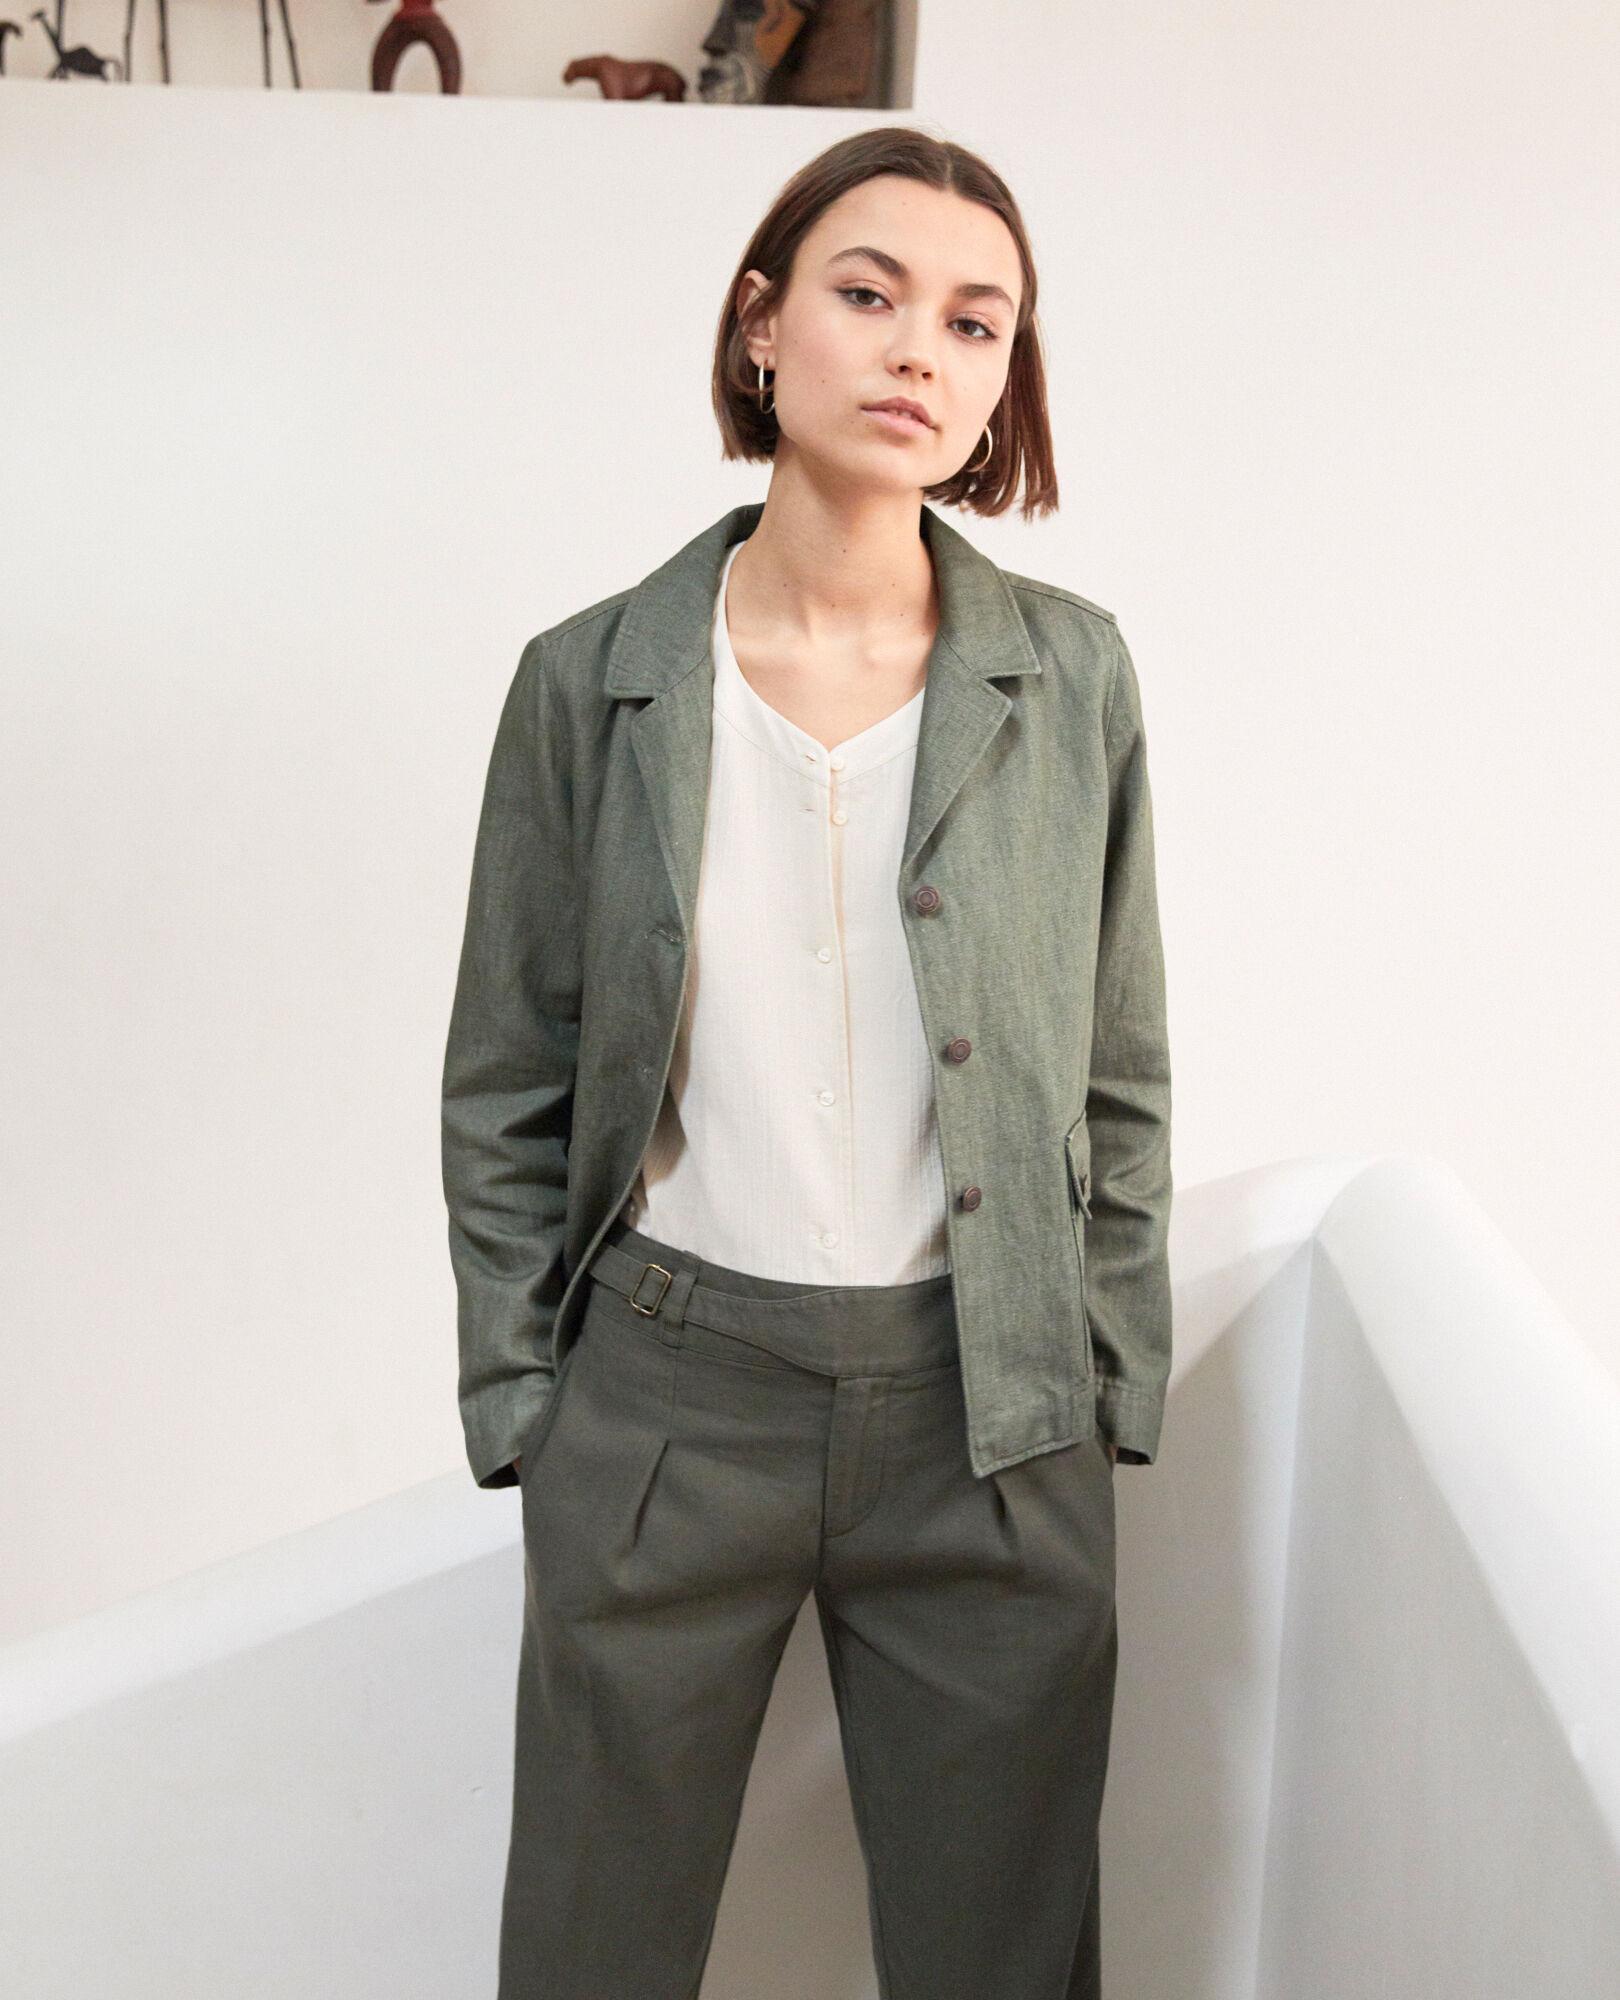 Petite veste courte femme beige